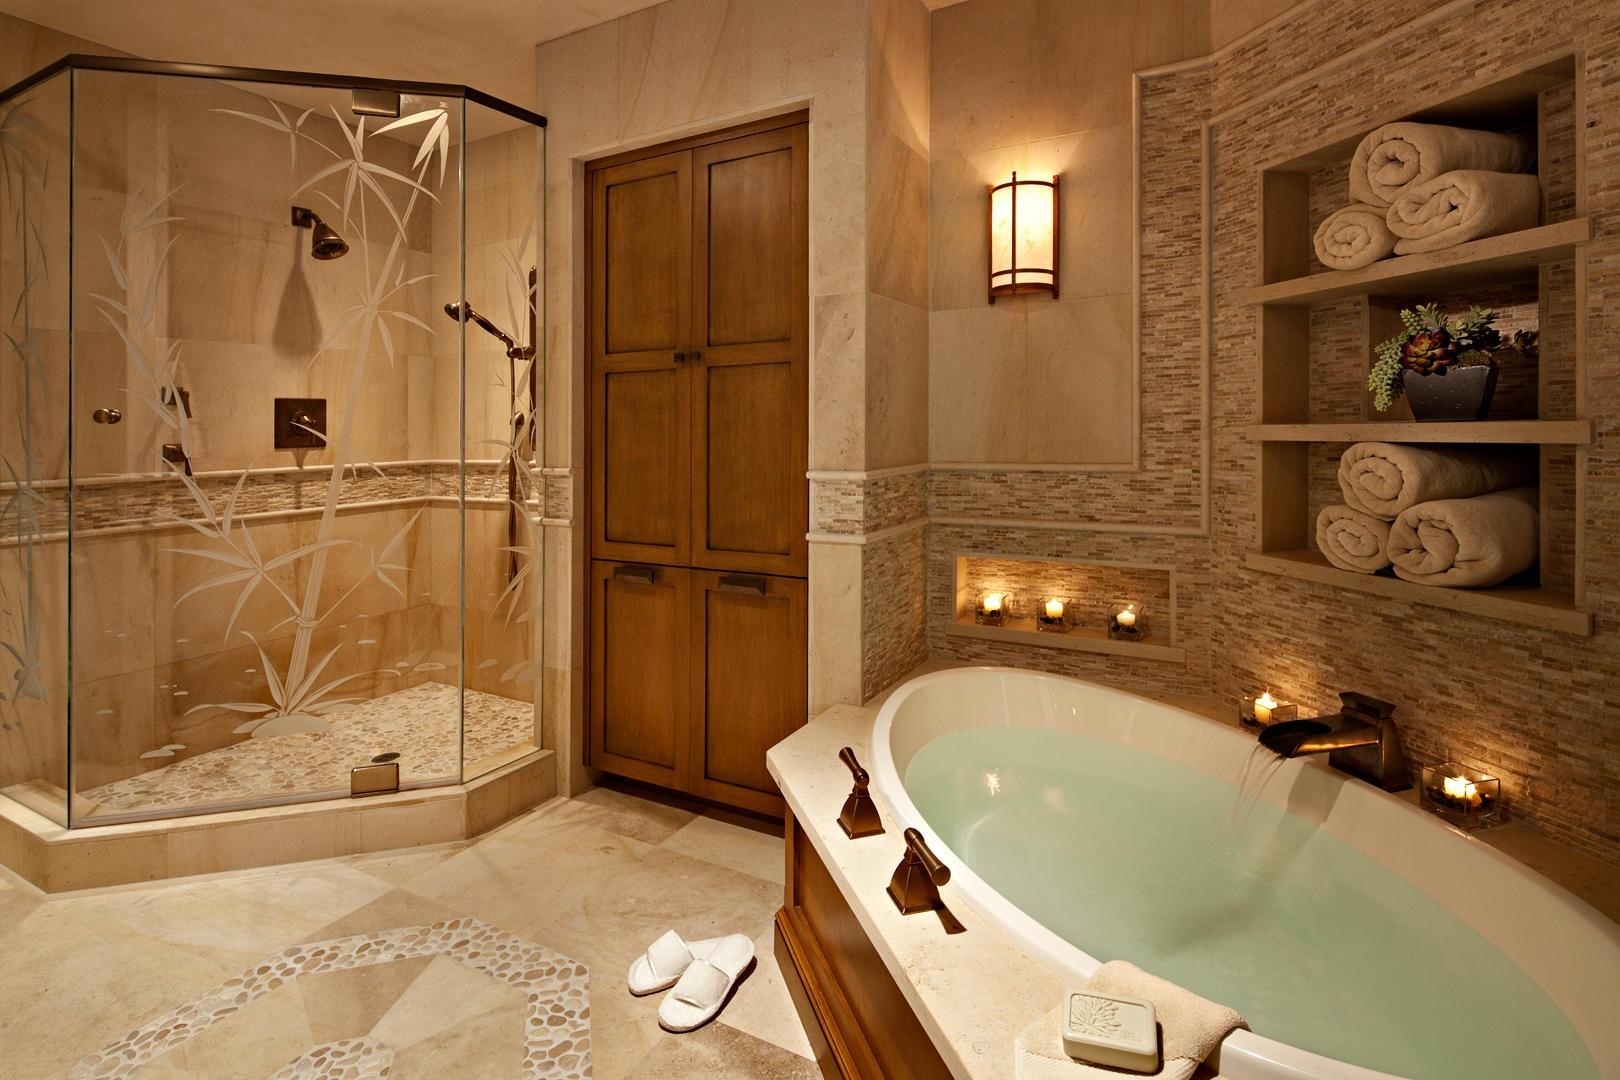 spa bathroom remodel photo - 2